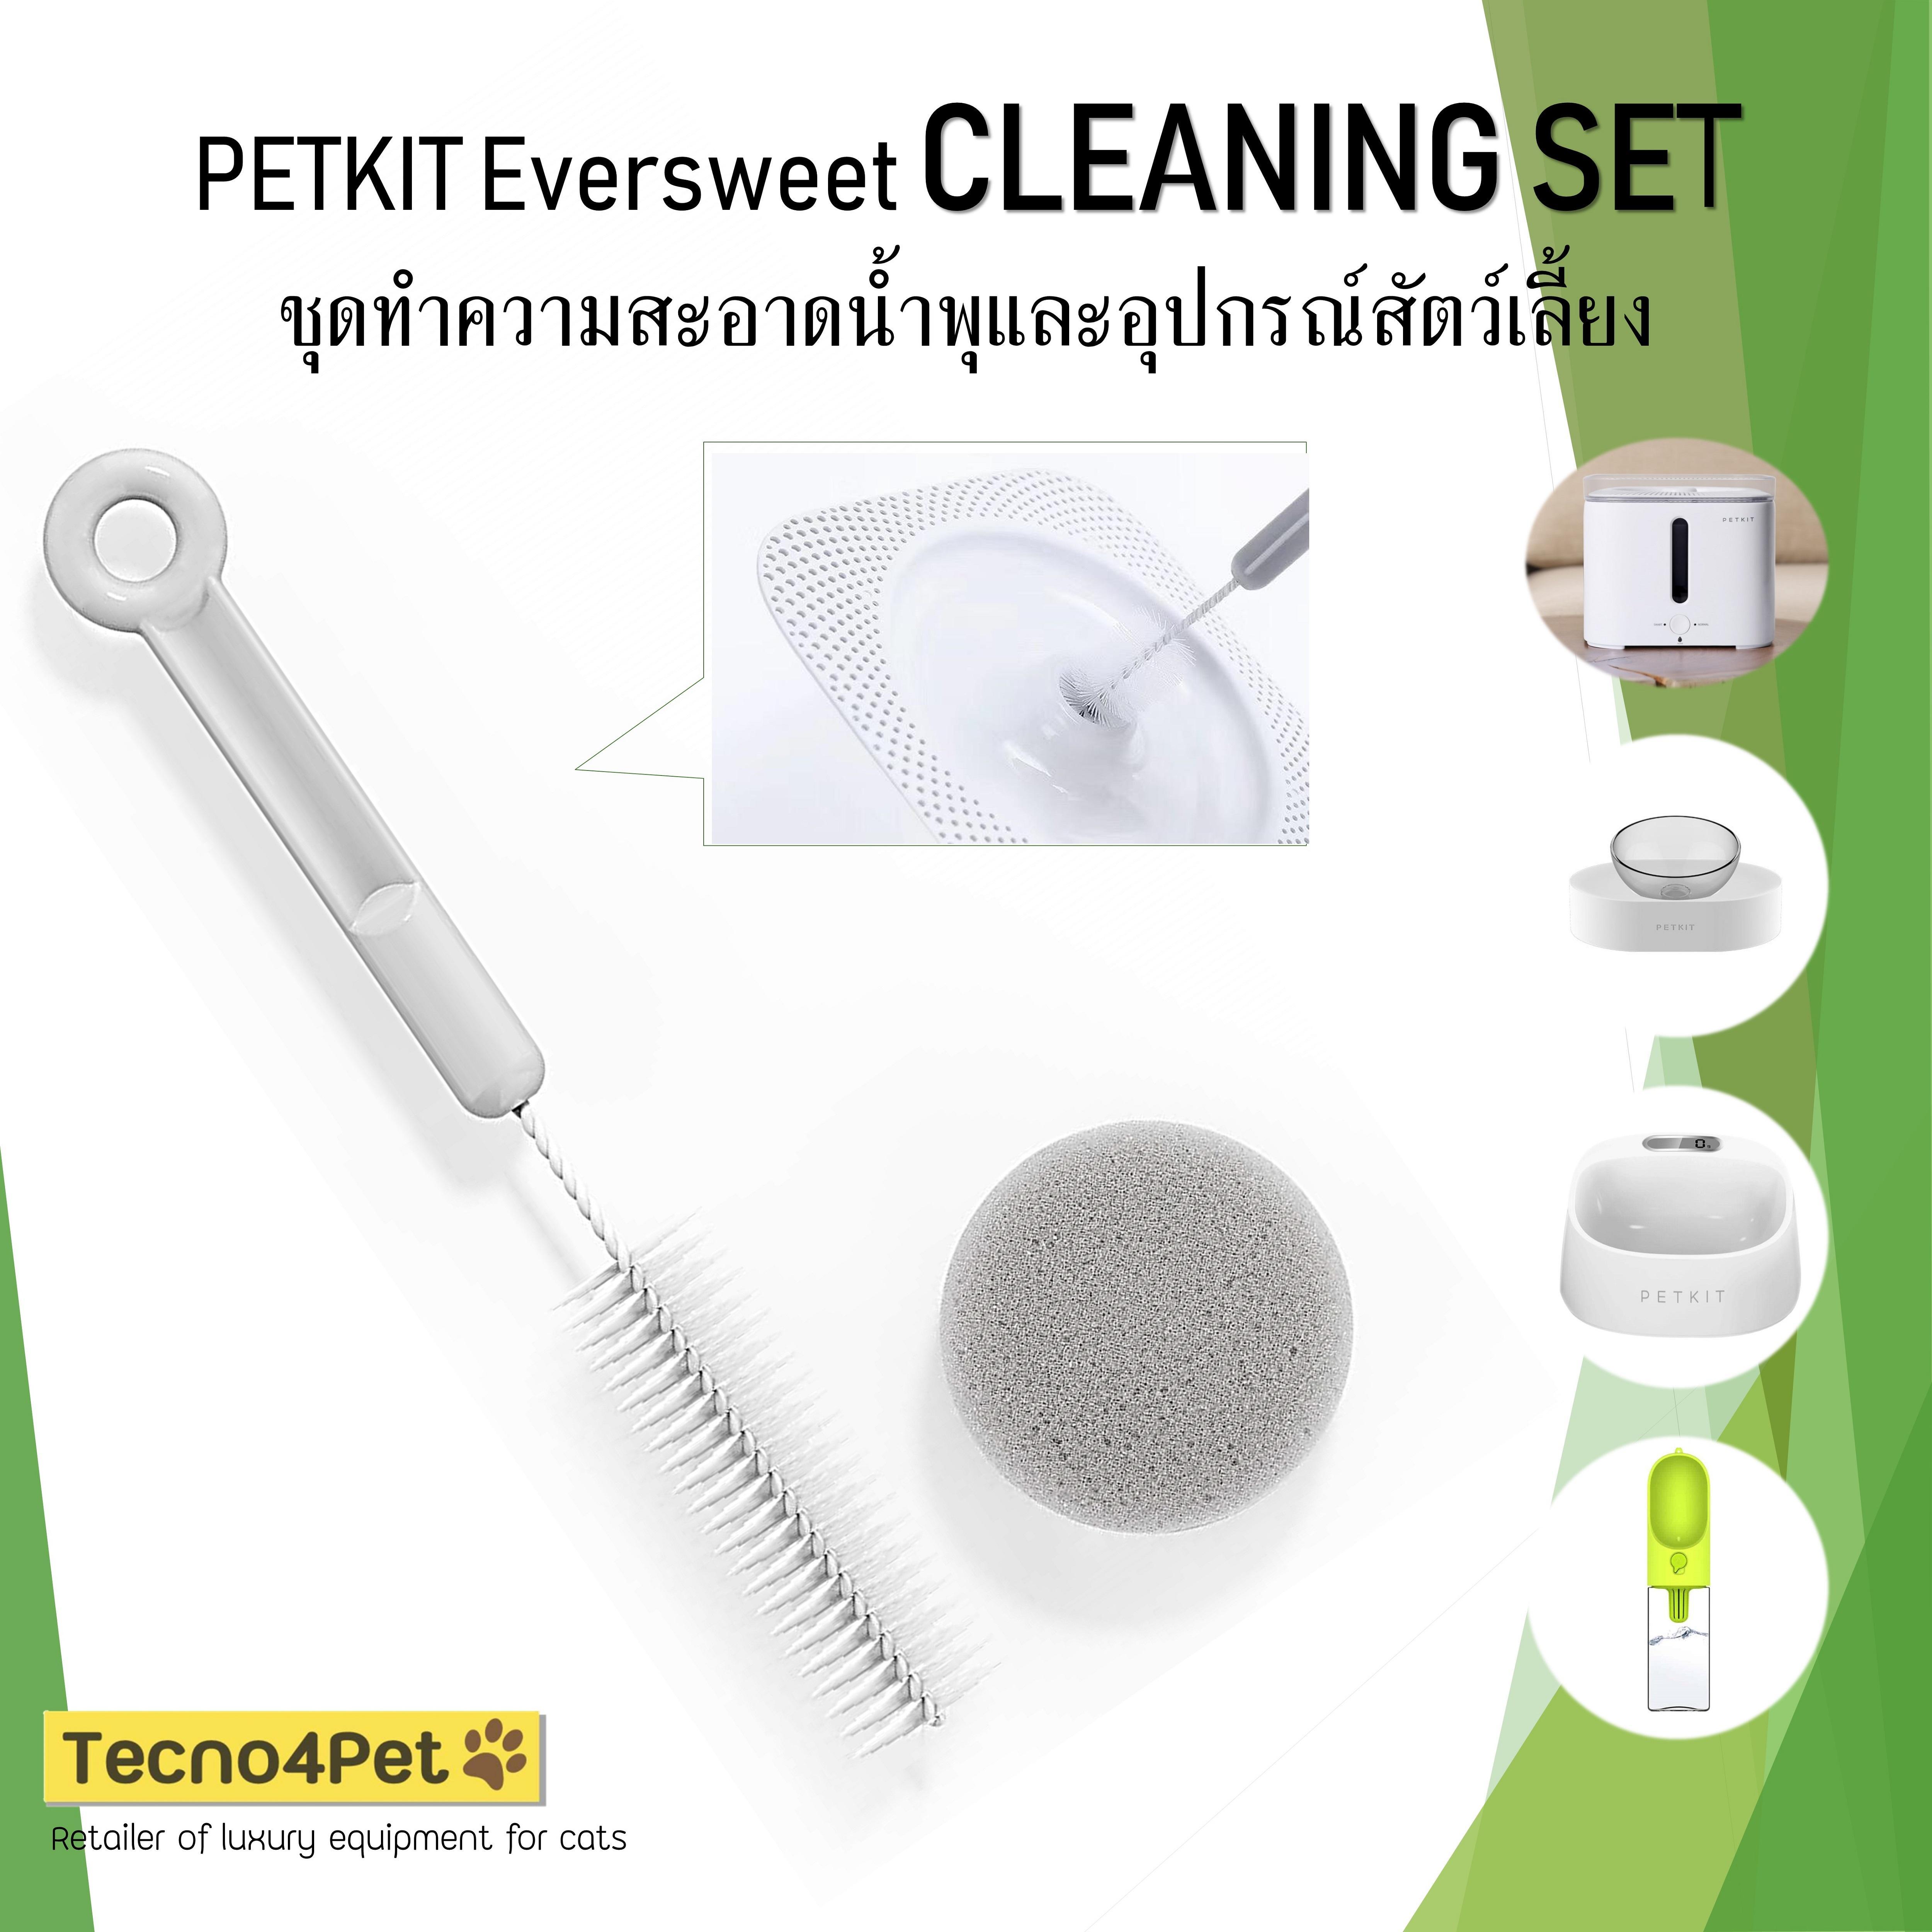 Petkit Cleaning Set - ชุดทำความสะอาดน้ำพุและอุปกรณ์สัตว์เลี้ยง By Tecno4pet.